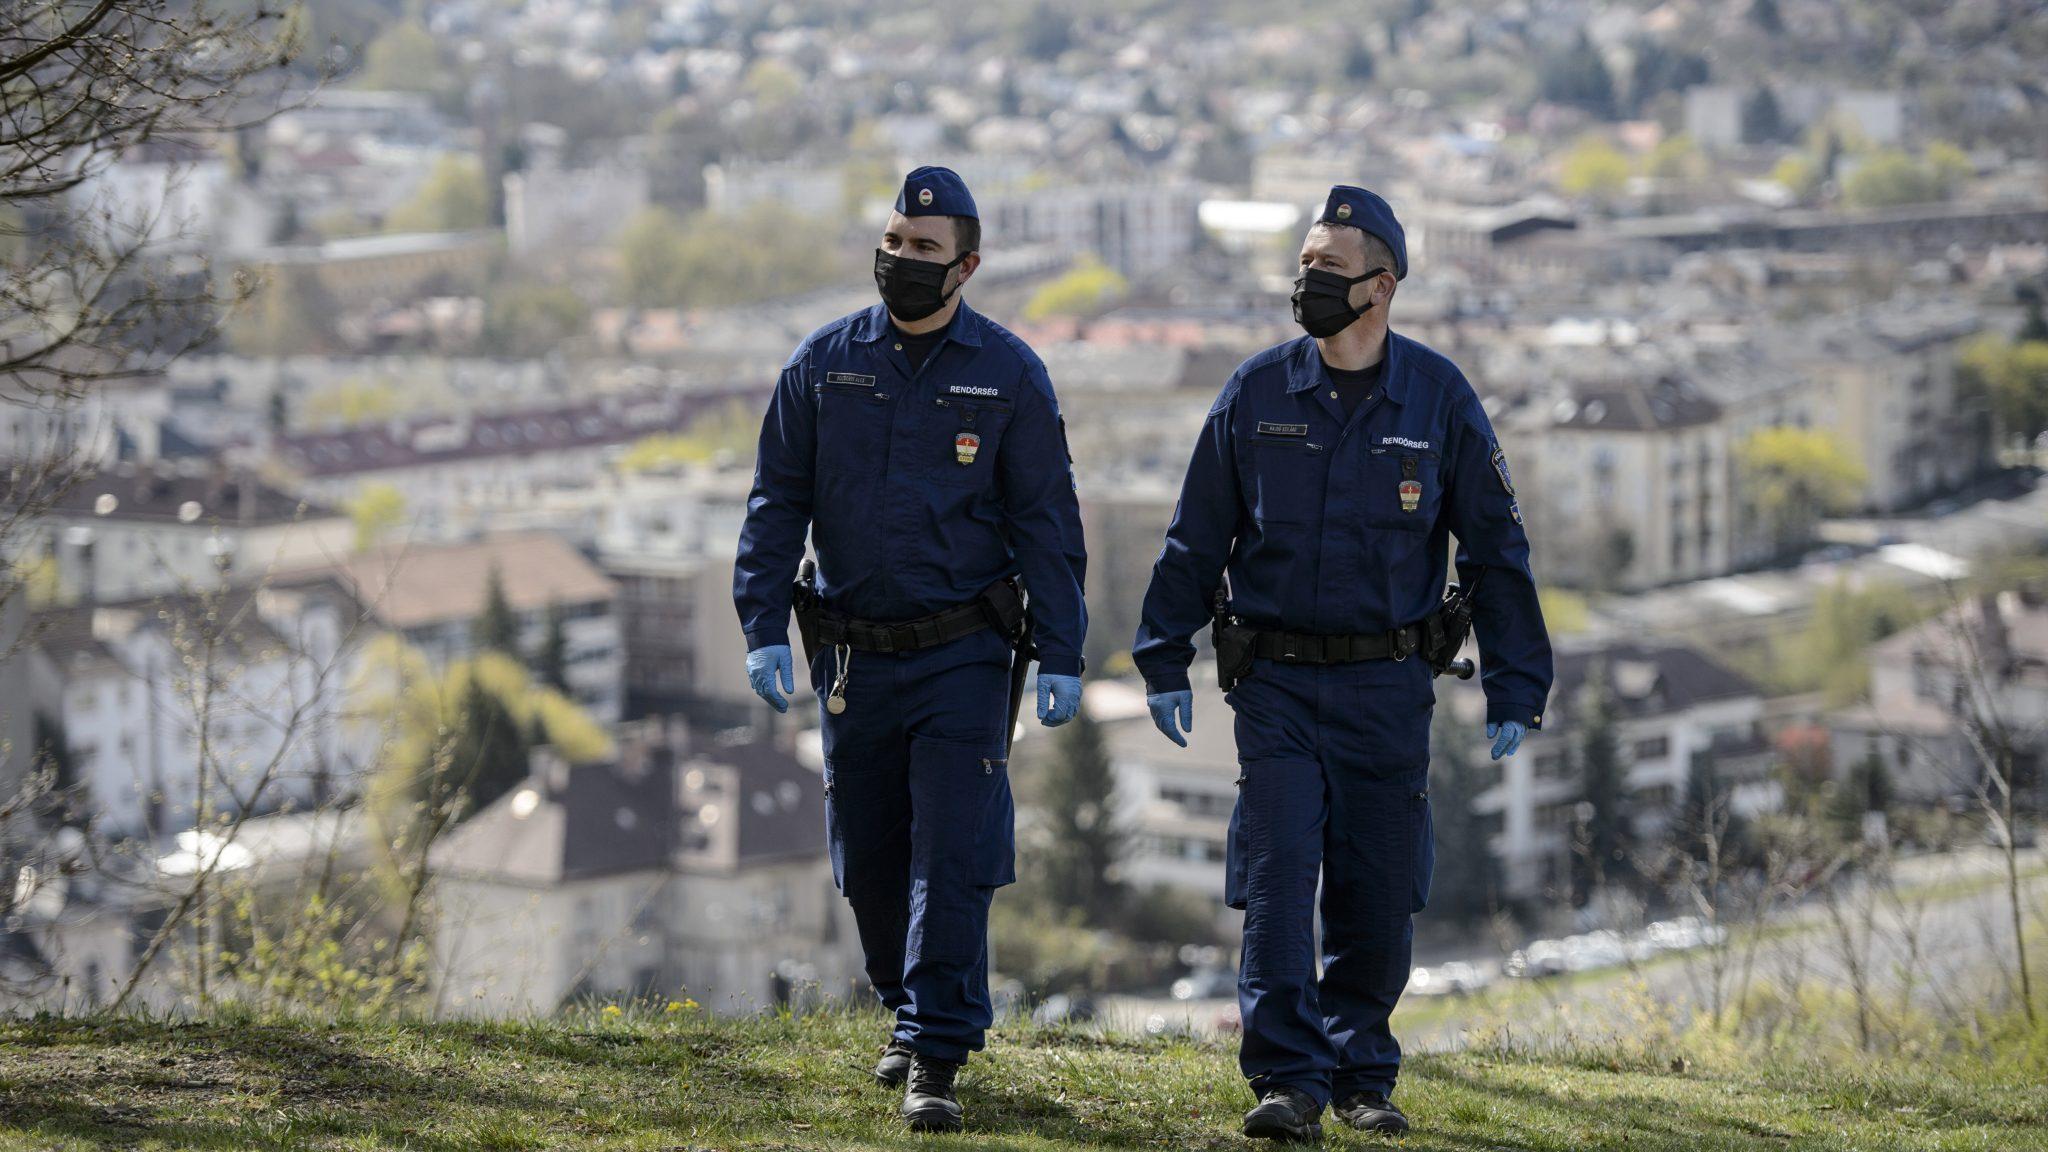 Gov't Announces Strict Lockdown Measures to Curb Covid Spread